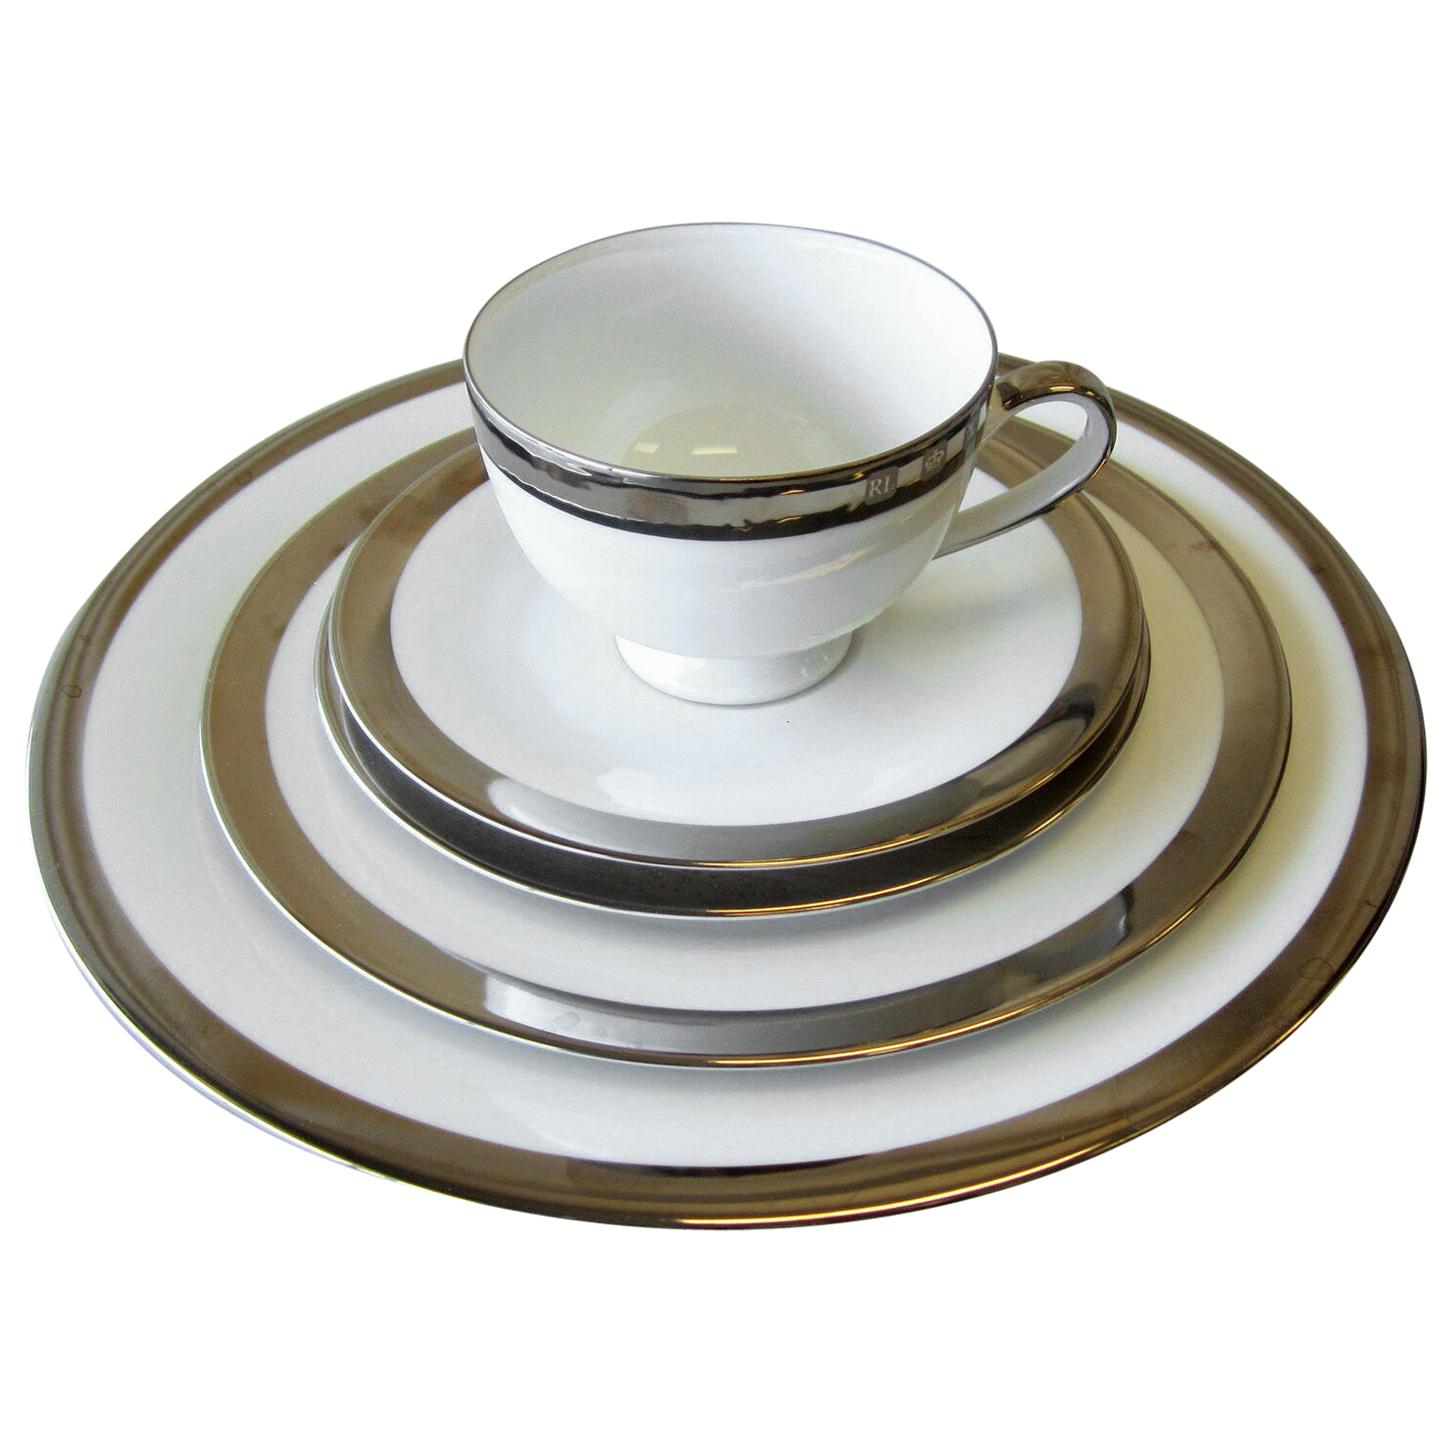 Ralph Lauren Academy Platinum Dinnerware, Set of 8 Place Settings